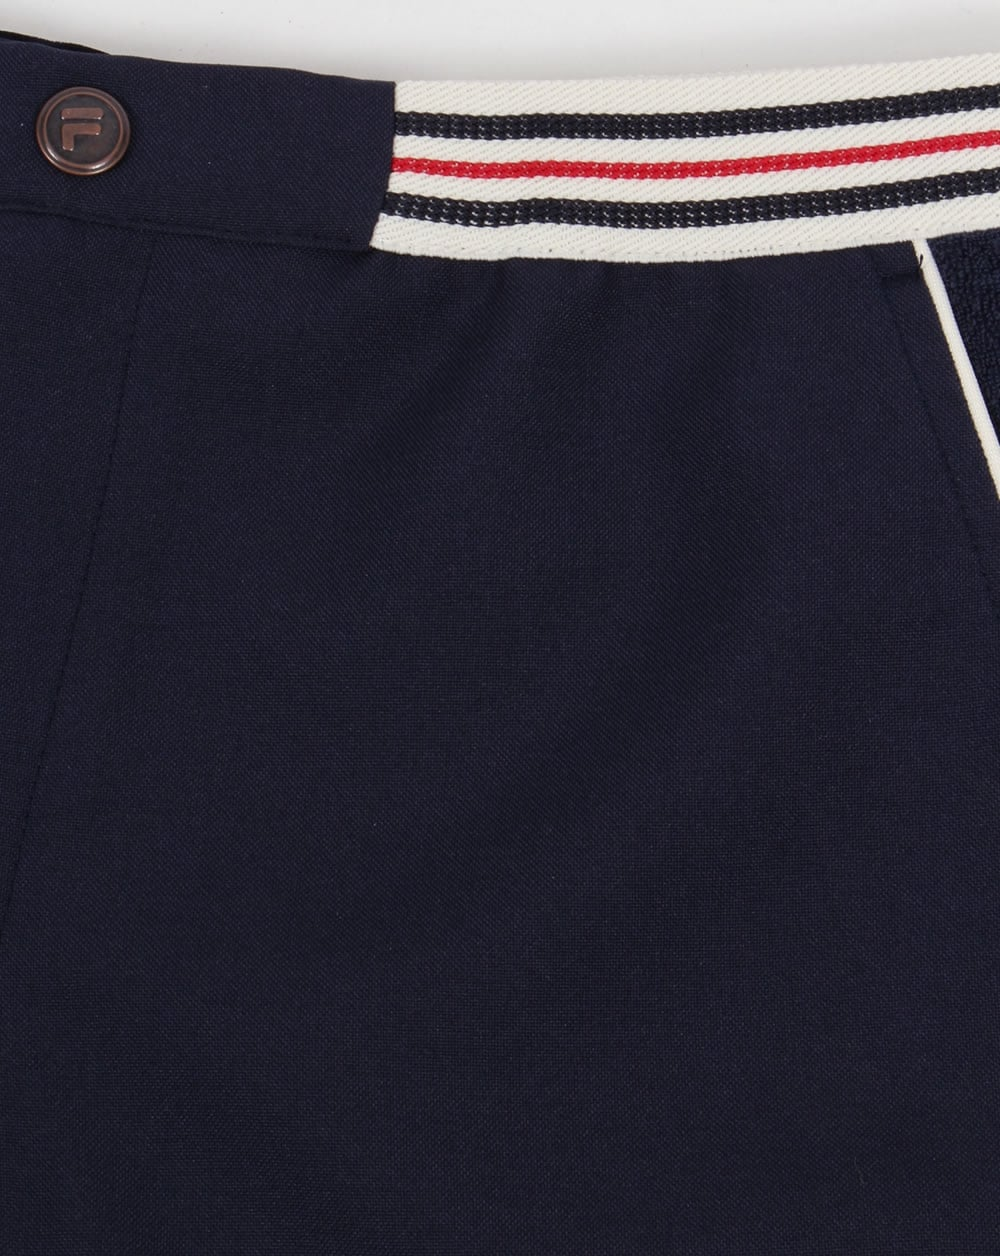 fila high tide shorts